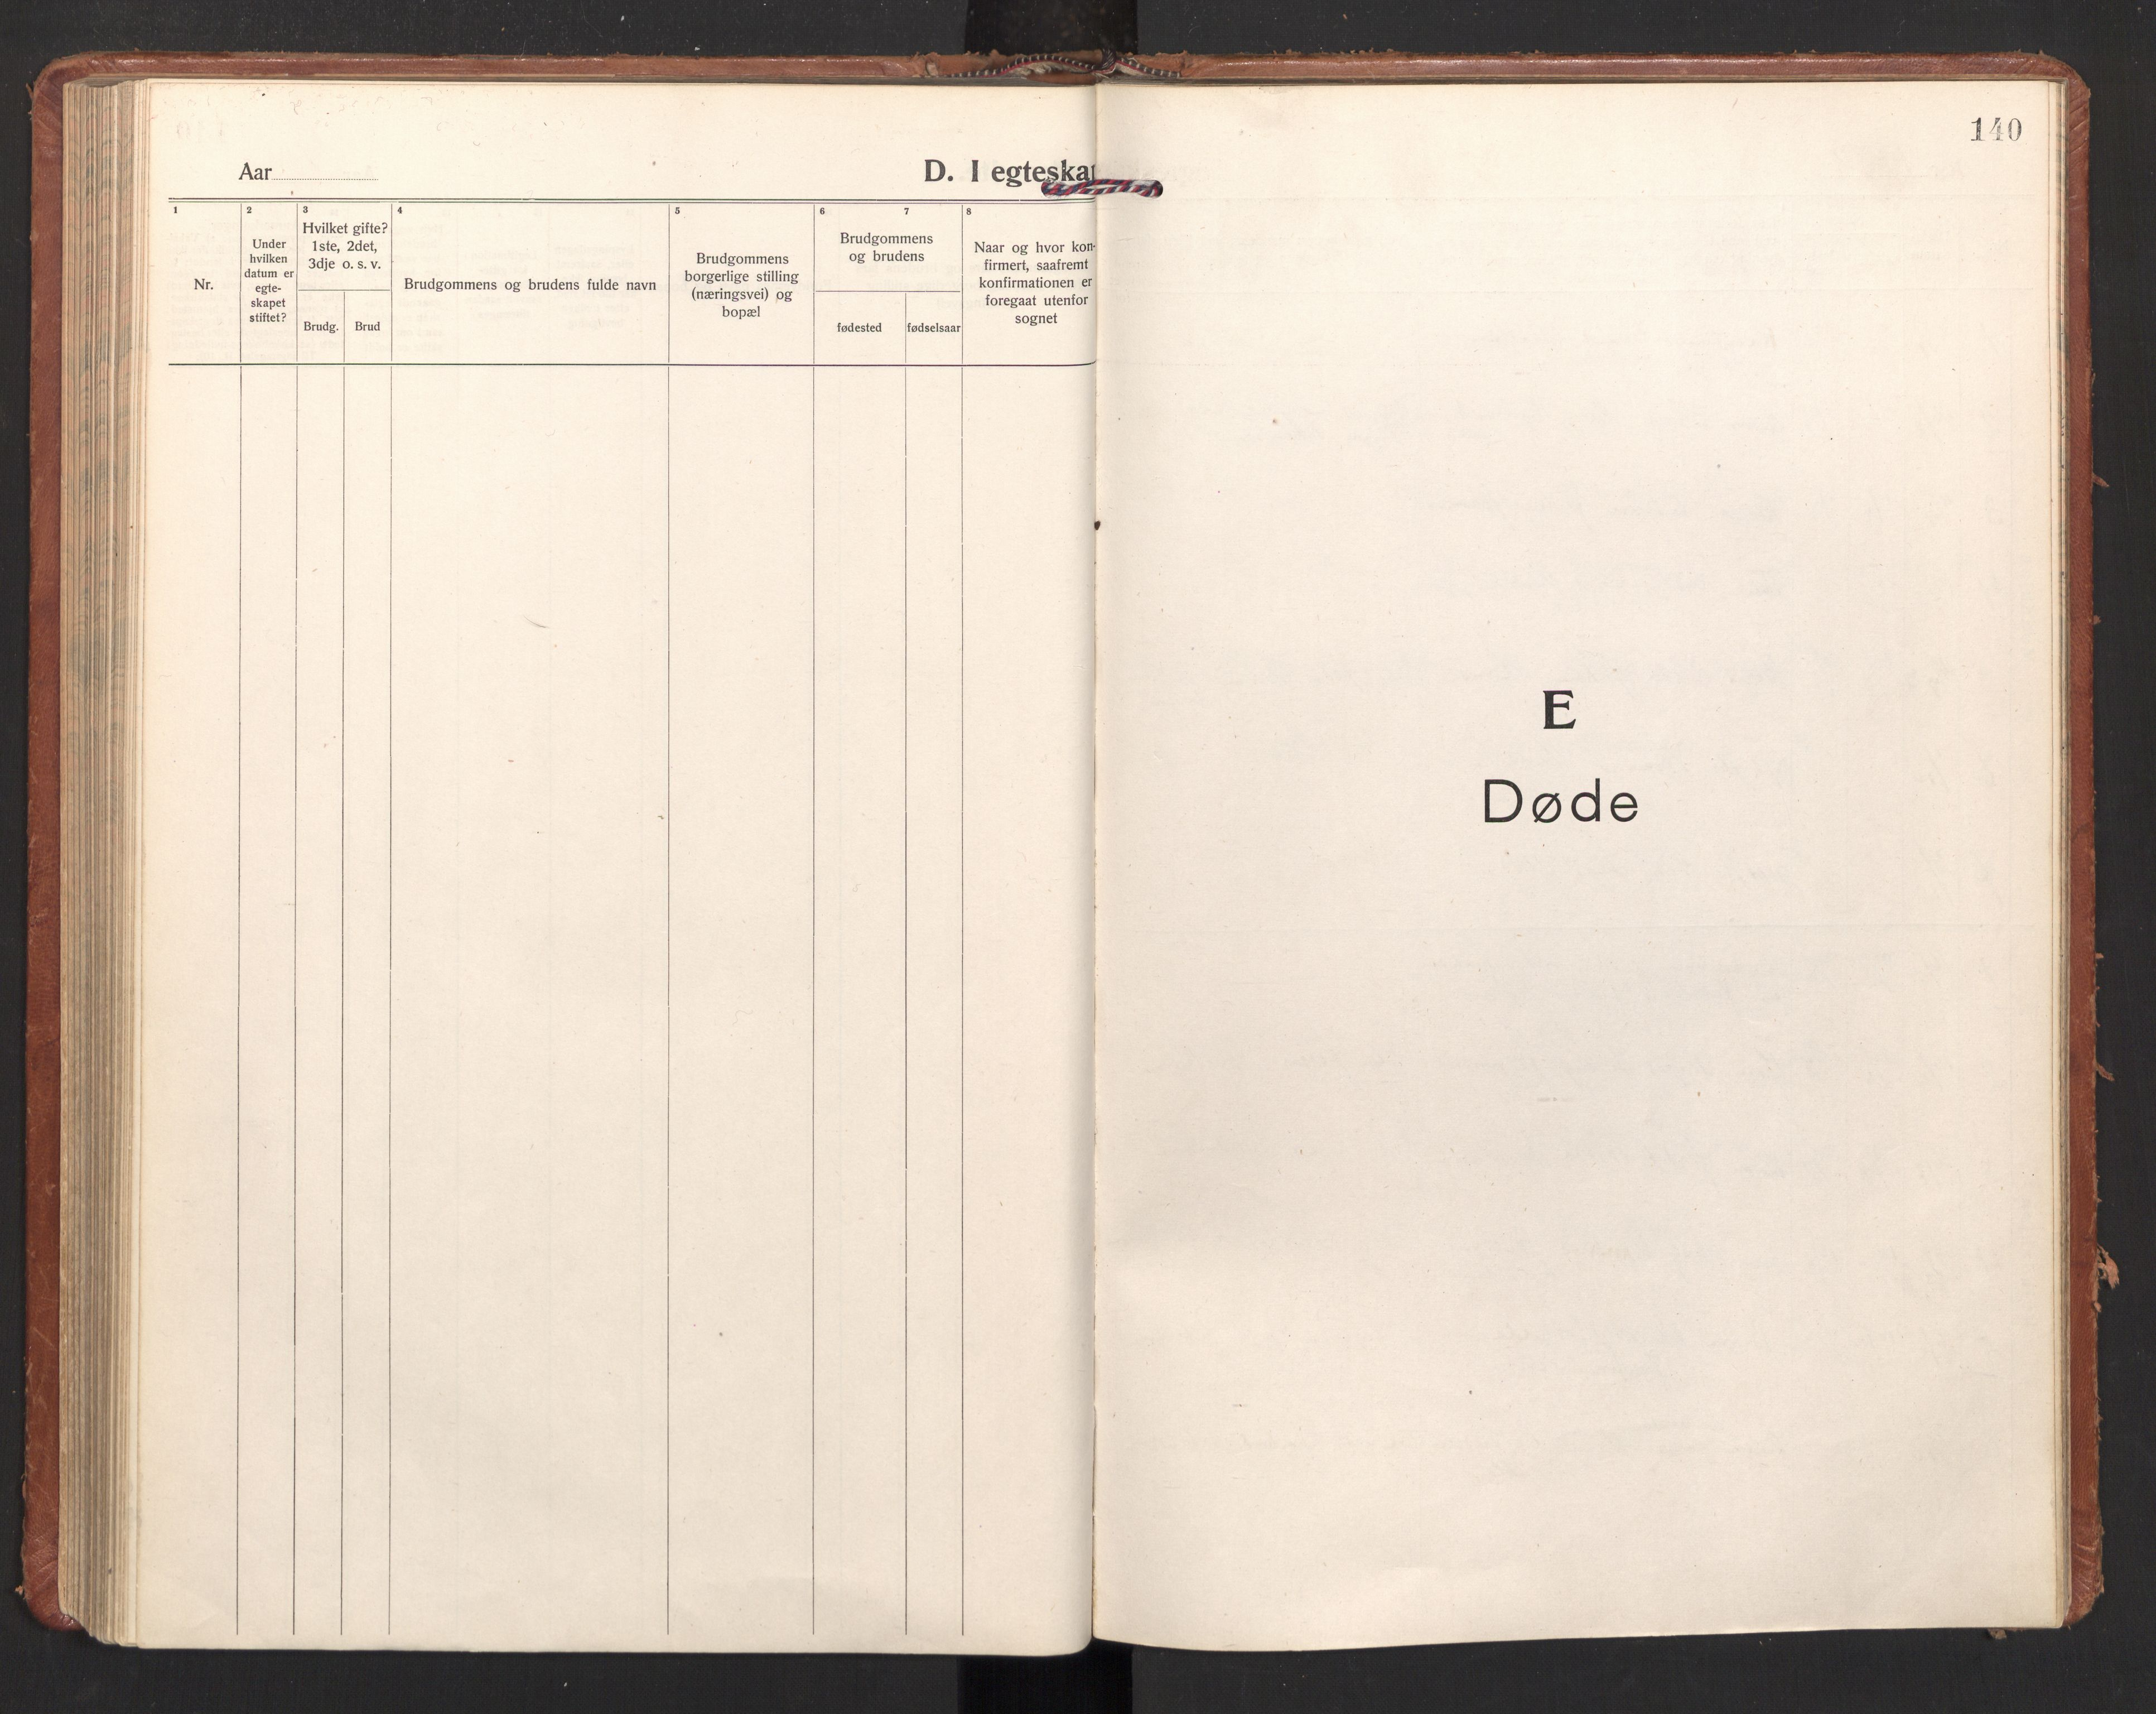 SAT, Ministerialprotokoller, klokkerbøker og fødselsregistre - Nordland, 897/L1408: Ministerialbok nr. 897A15, 1922-1938, s. 140